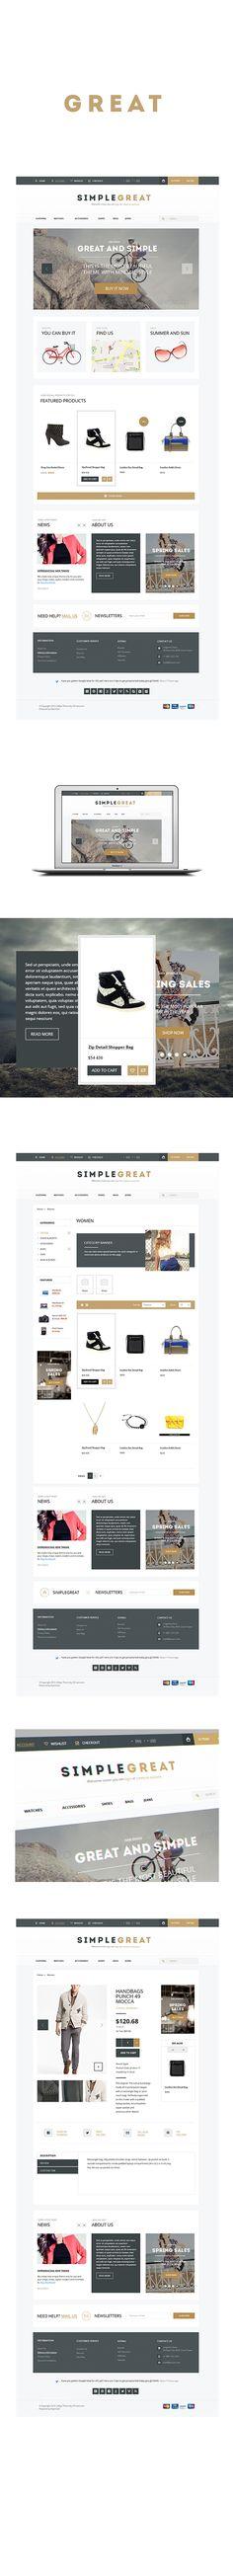 SimpleGreat on Web Design Served